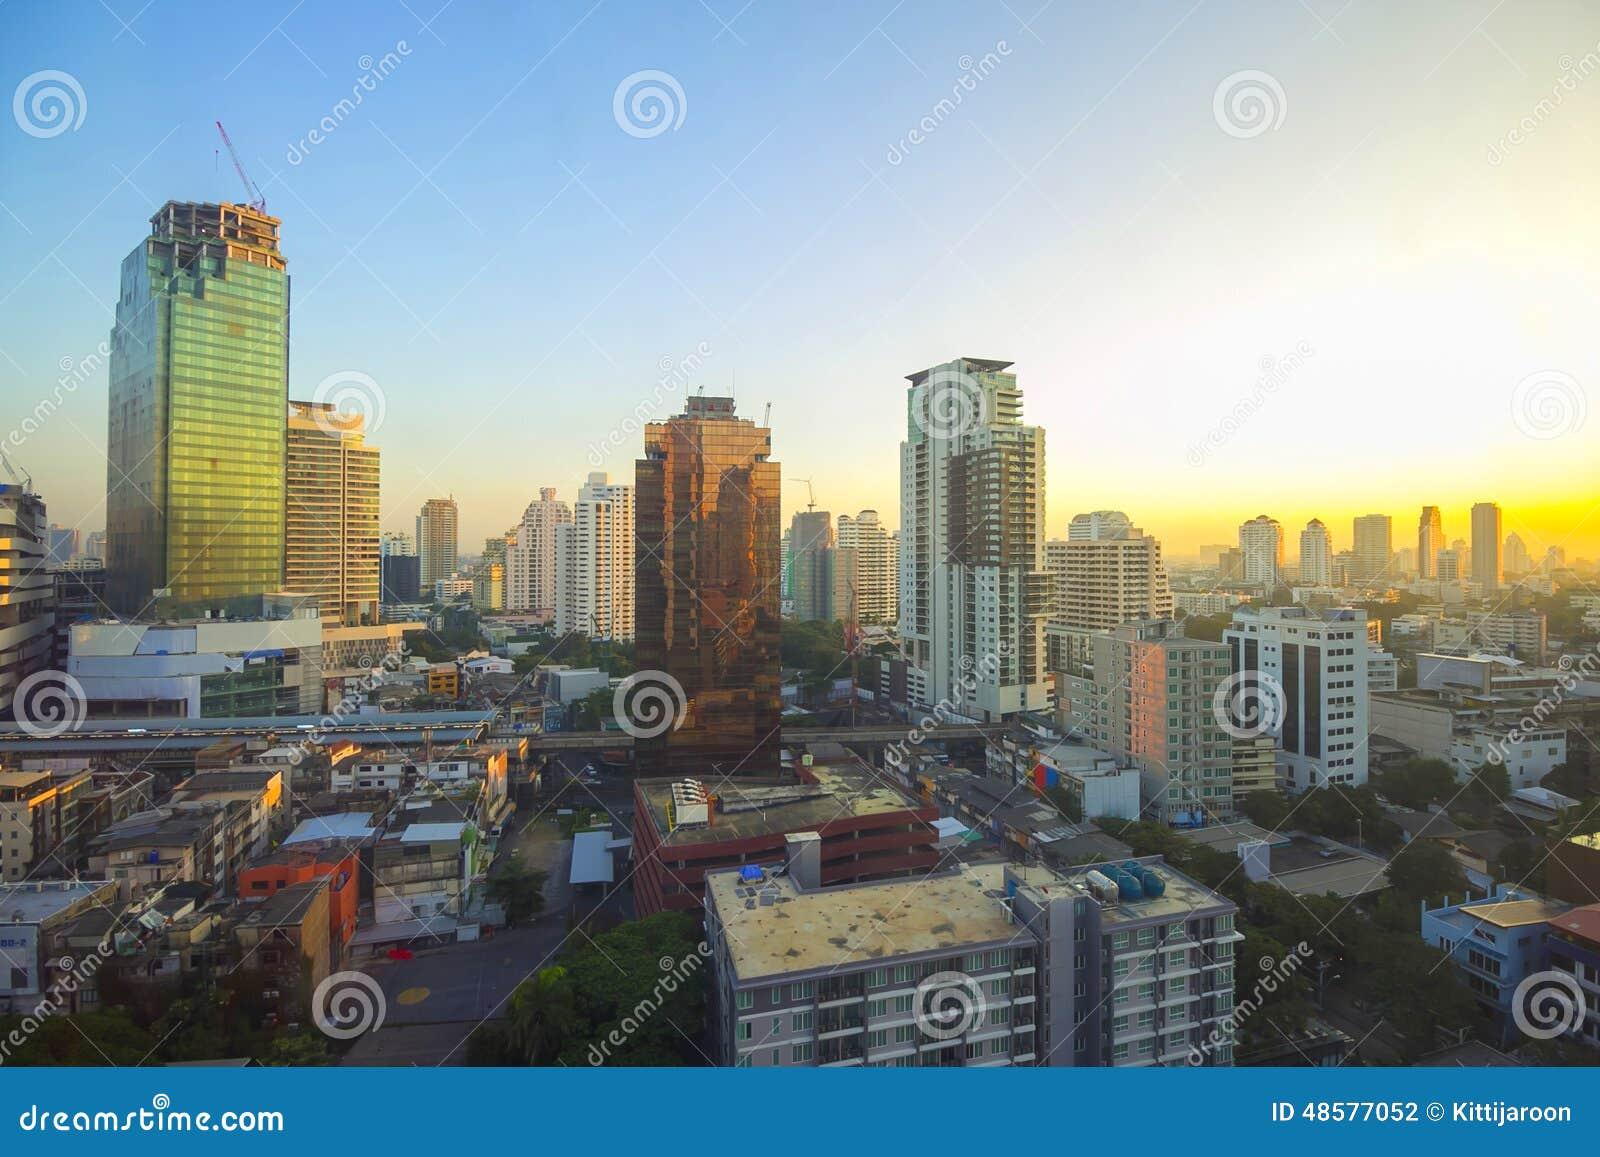 Vue de paysage urbain pendant le matin à Bangkok